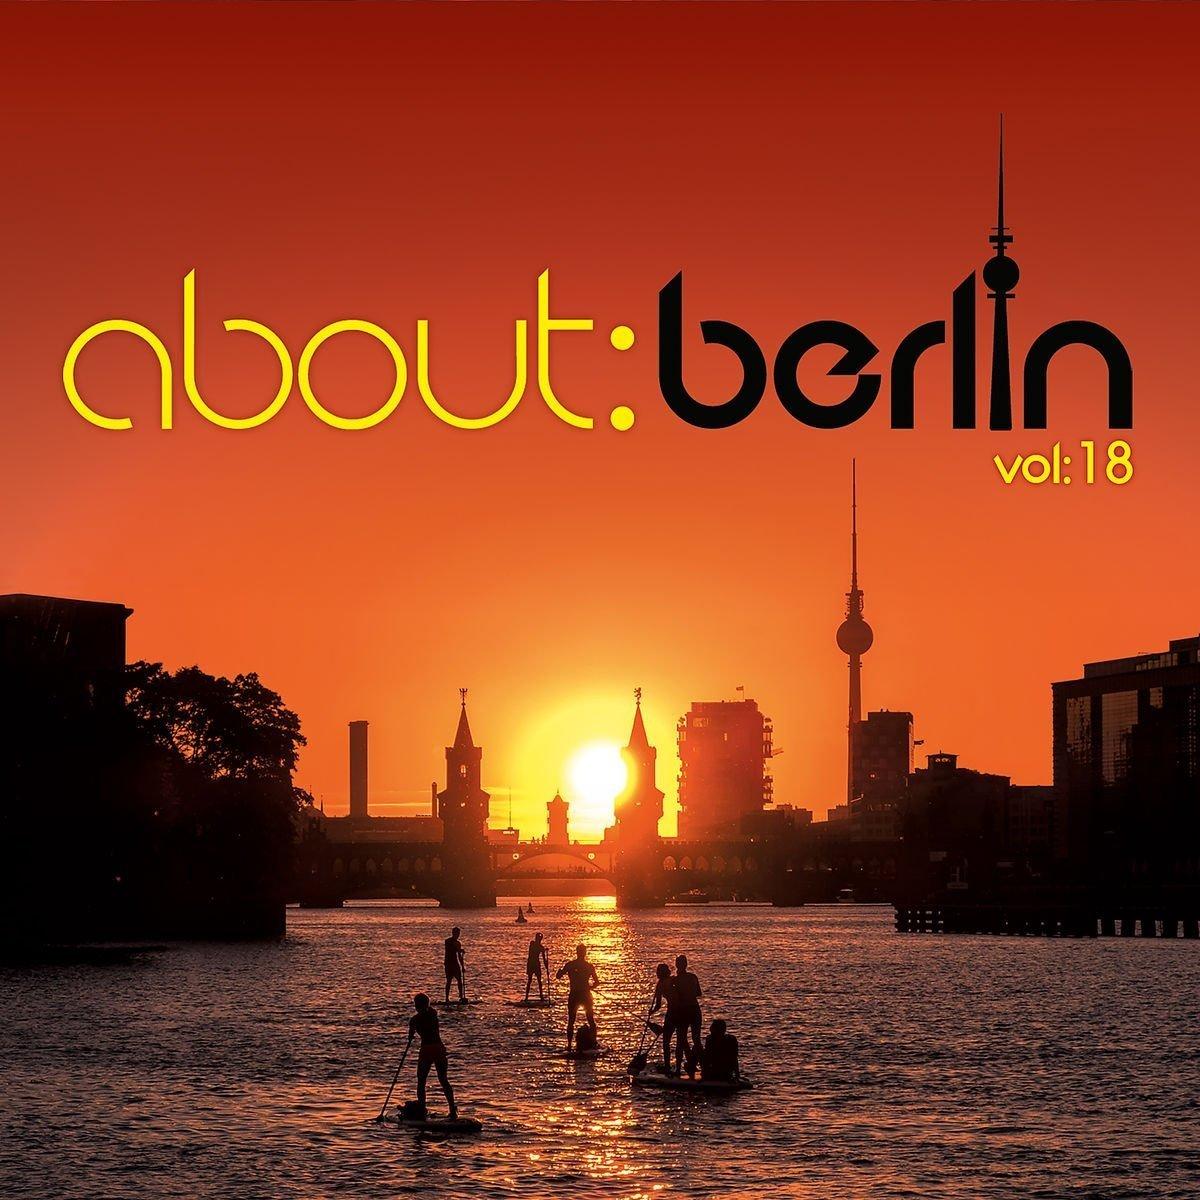 VA - About Berlin Vol 18 - 2CD - FLAC - 2017 - VOLDiES Download